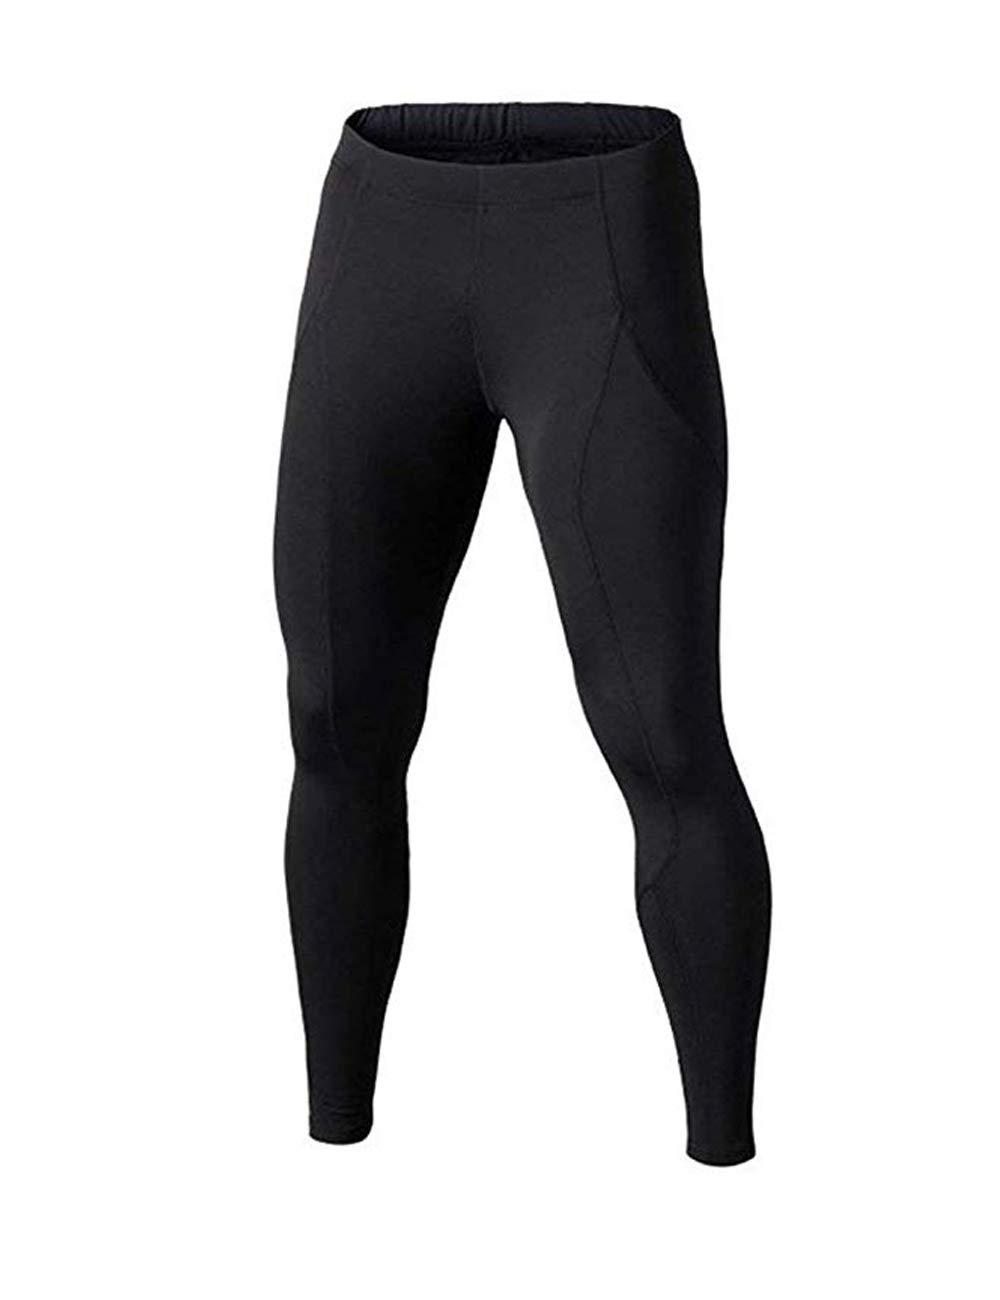 BUYKUD Kids' Boys Long Sleeve Base Layer Compression Underwear Athletic Shirt Tights Top & Bottom Set 3